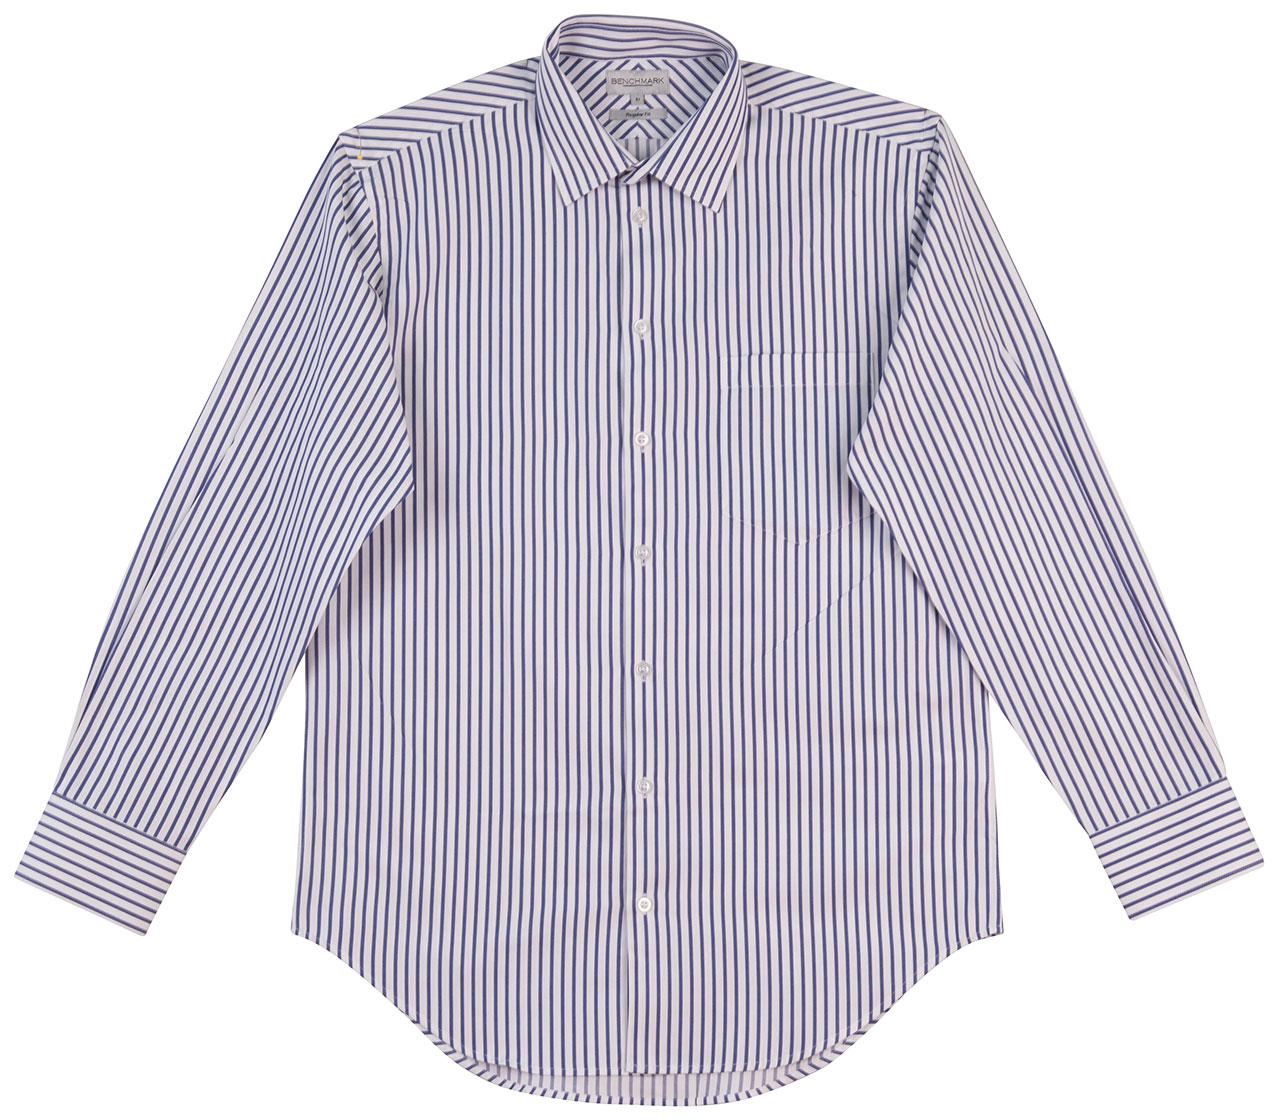 M7001 Men's Nano™ Tech Short Sleeve Shirt